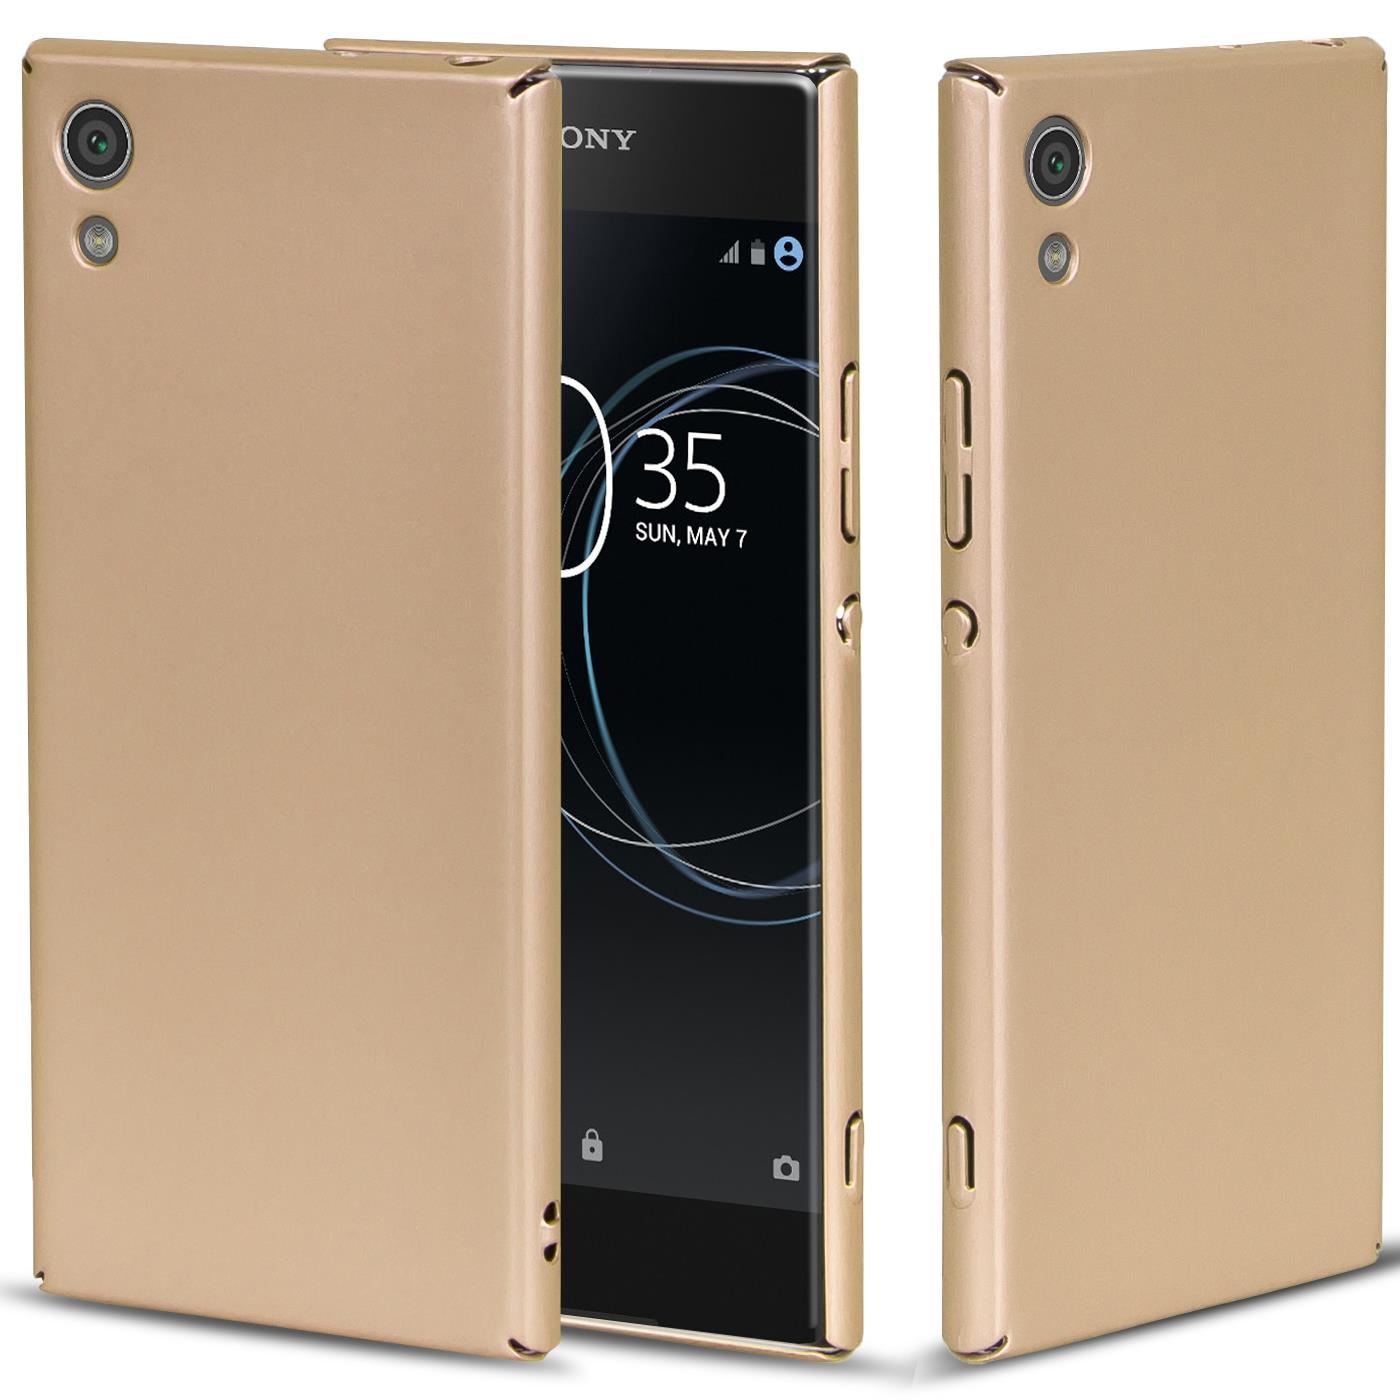 Sony-Xperia-Huelle-Handy-Case-Hardcase-Schutz-Cover-Slim-Tasche-Flache-Handyhuelle